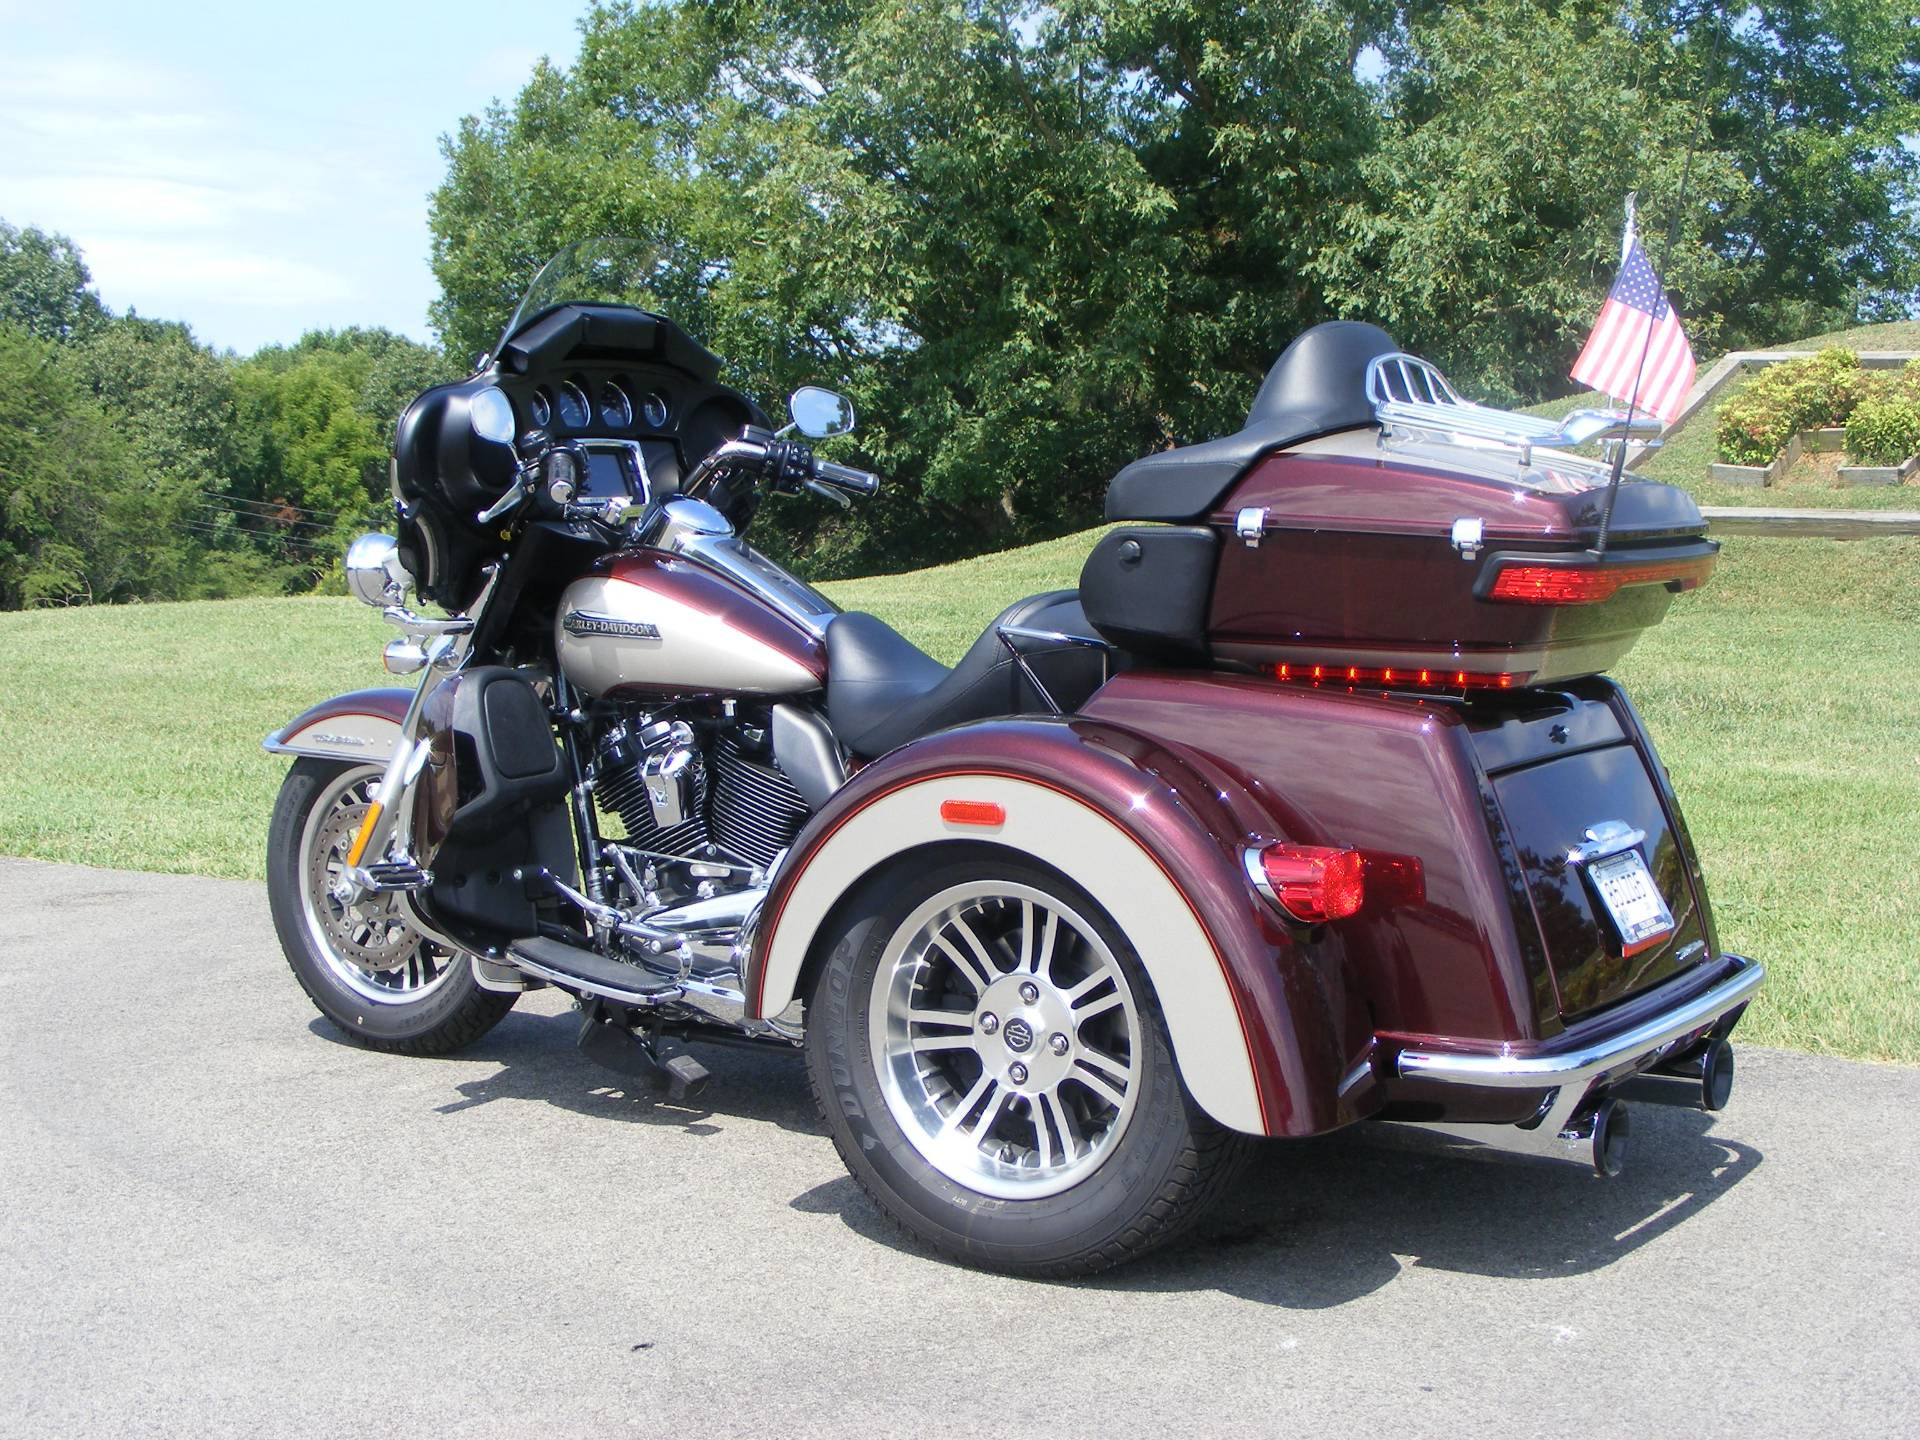 2018 Harley-Davidson Tri Glide® Ultra in Morristown, Tennessee